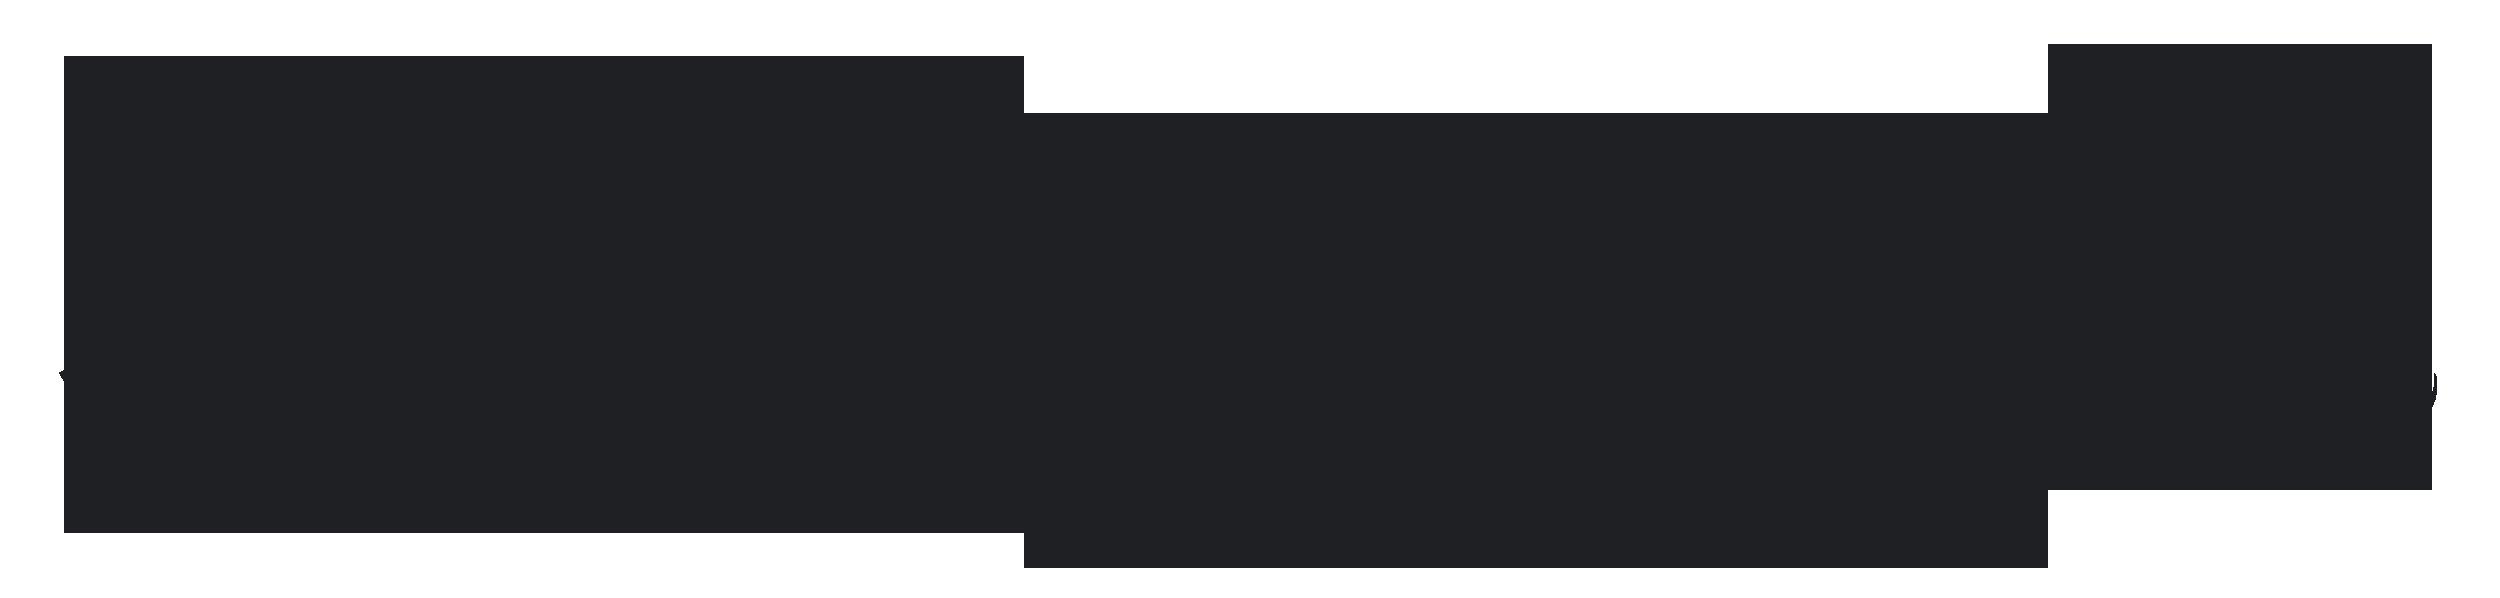 Extreminal | Extreme Metal Magazine